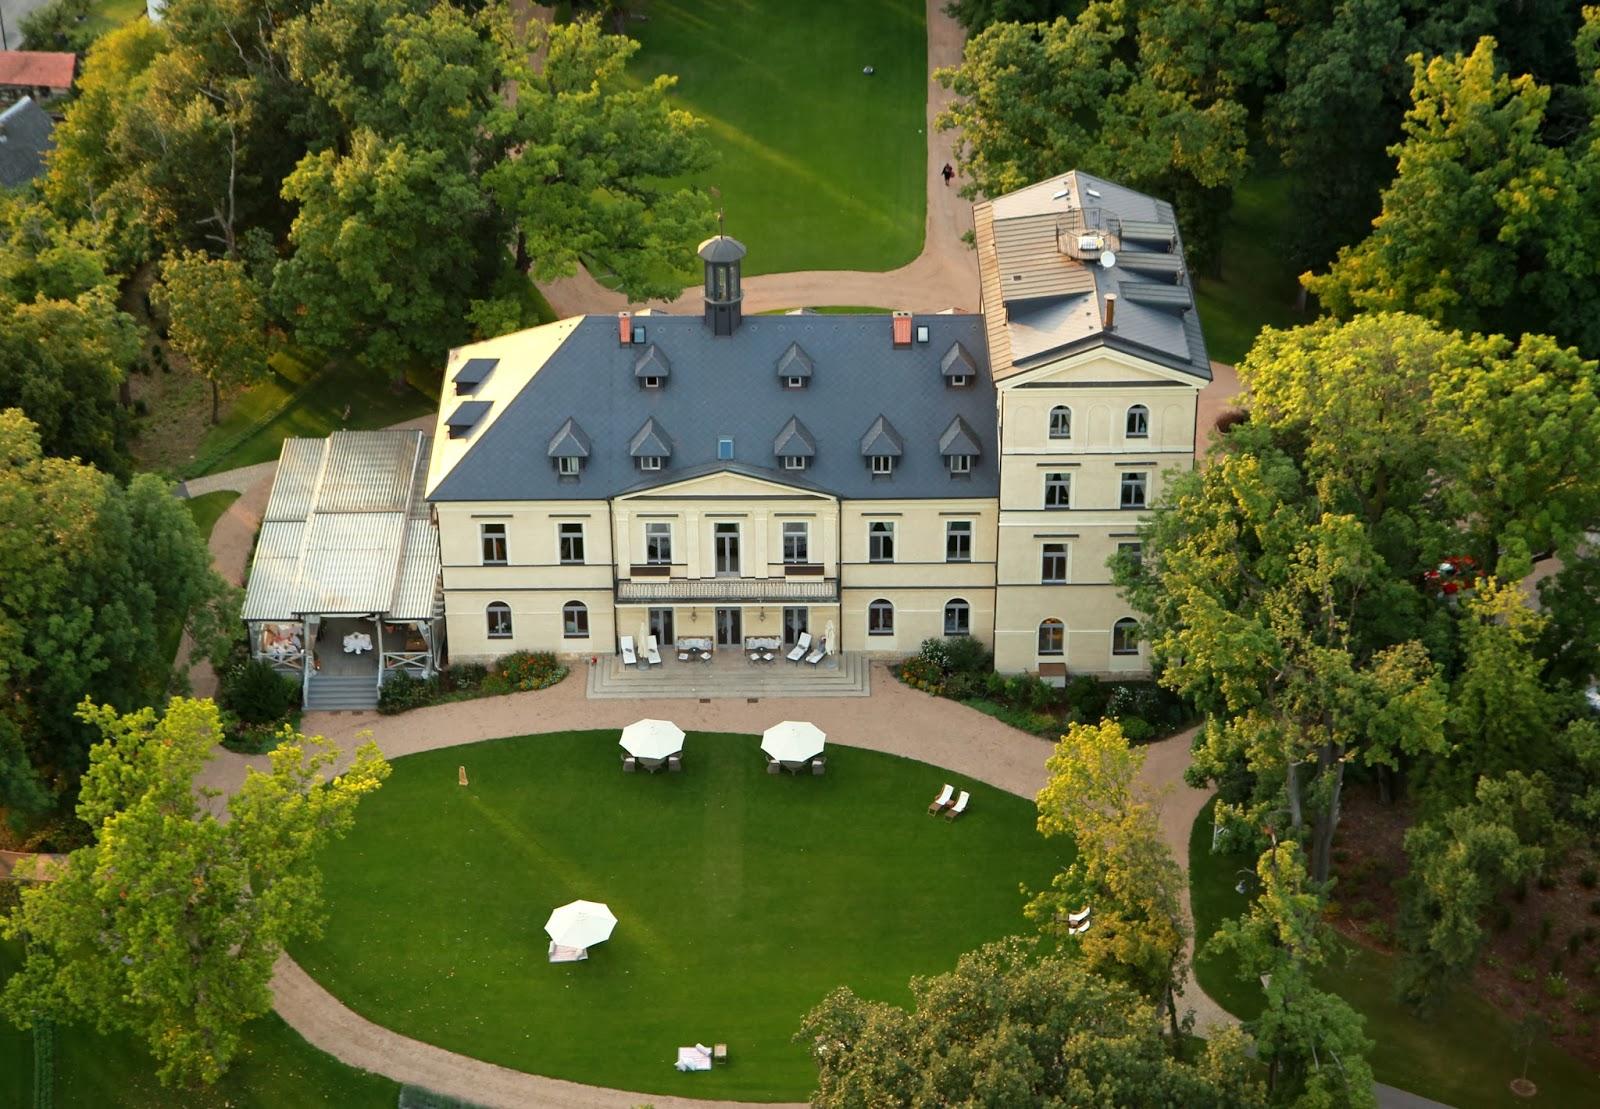 Mcely Czech Republic  city photos gallery : Passion For Luxury : Chateau Mcely Prague, Czech Republic